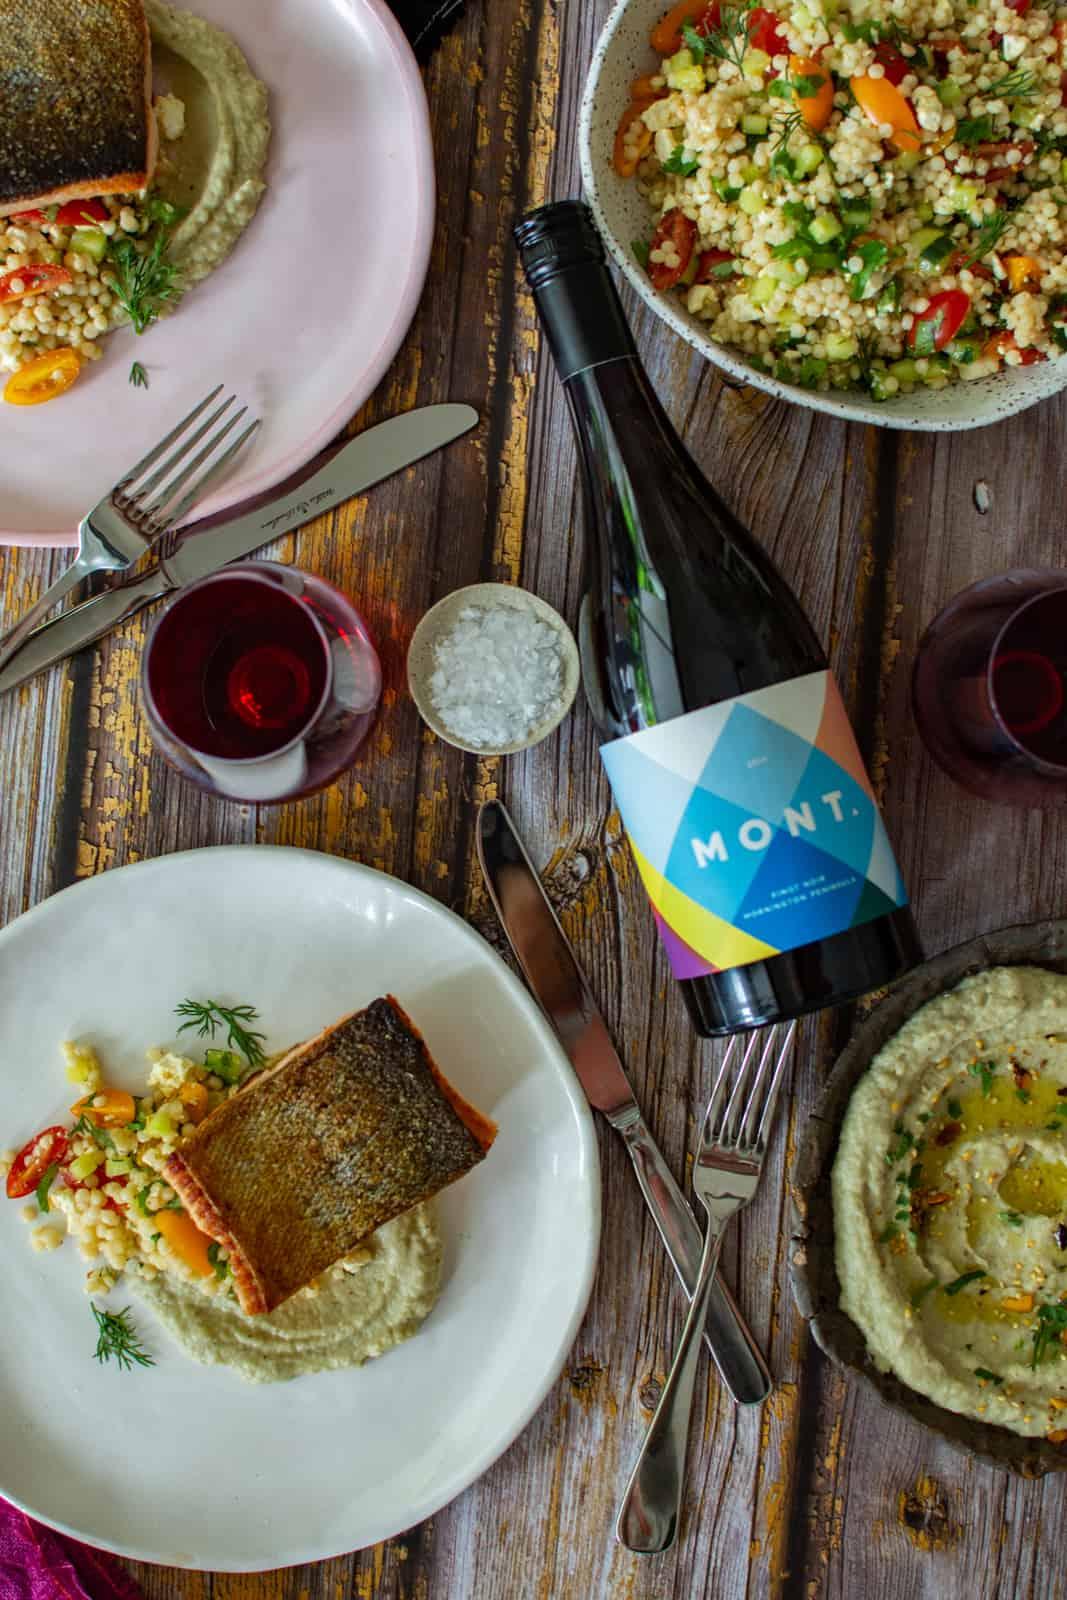 Moroccan salmon, baba ghanoush, pearl couscous & Mont pinot noir